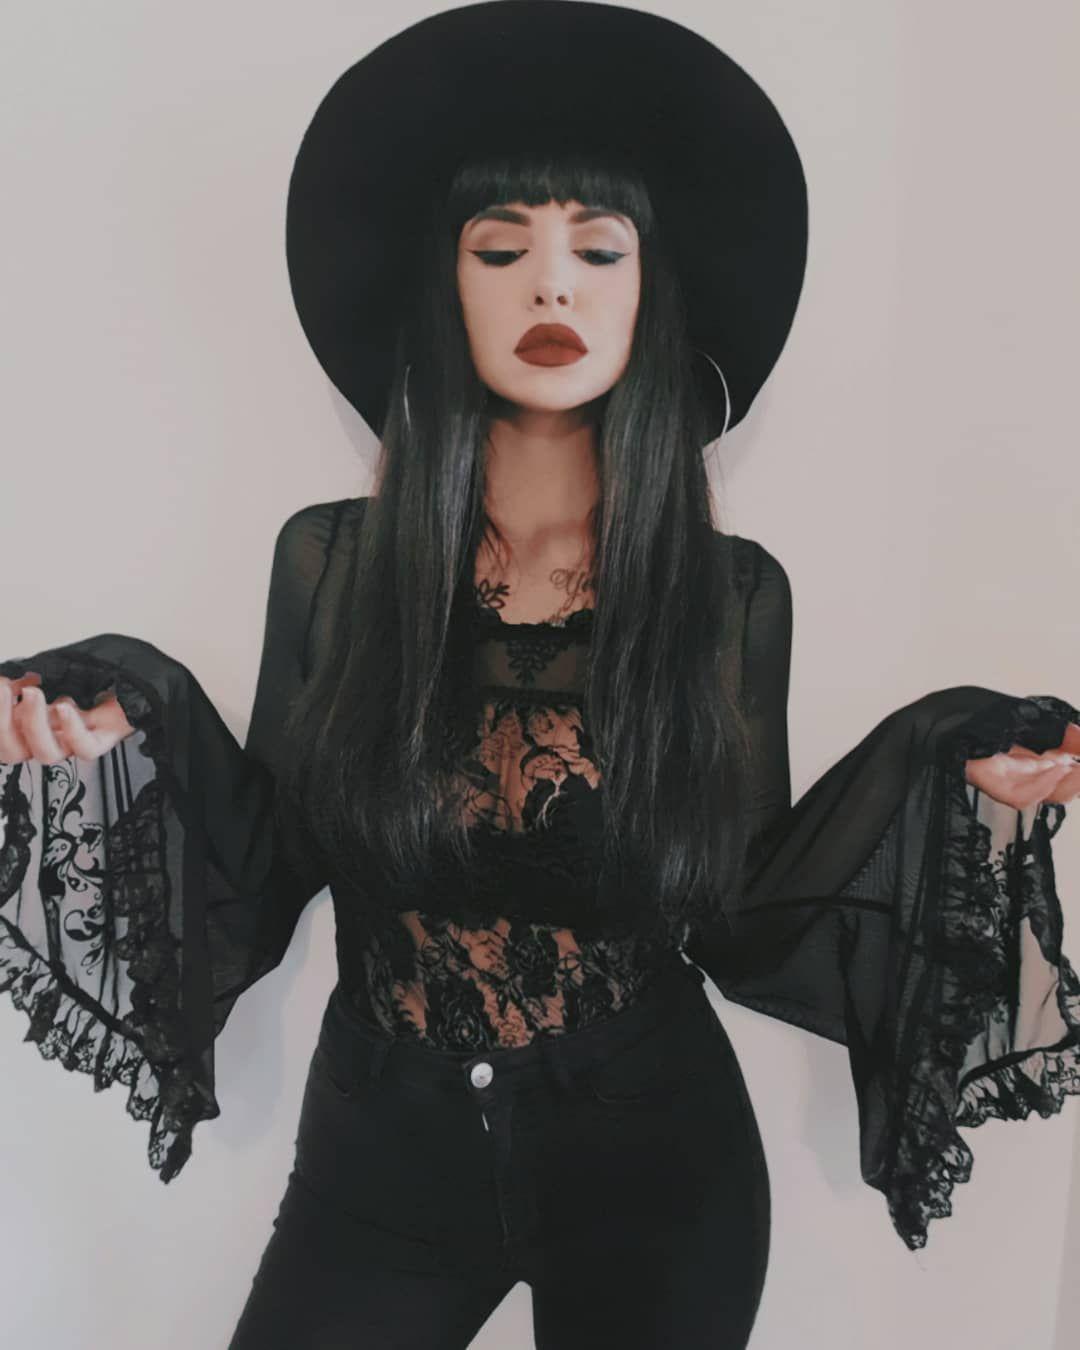 Goth - Gyakori kérdések